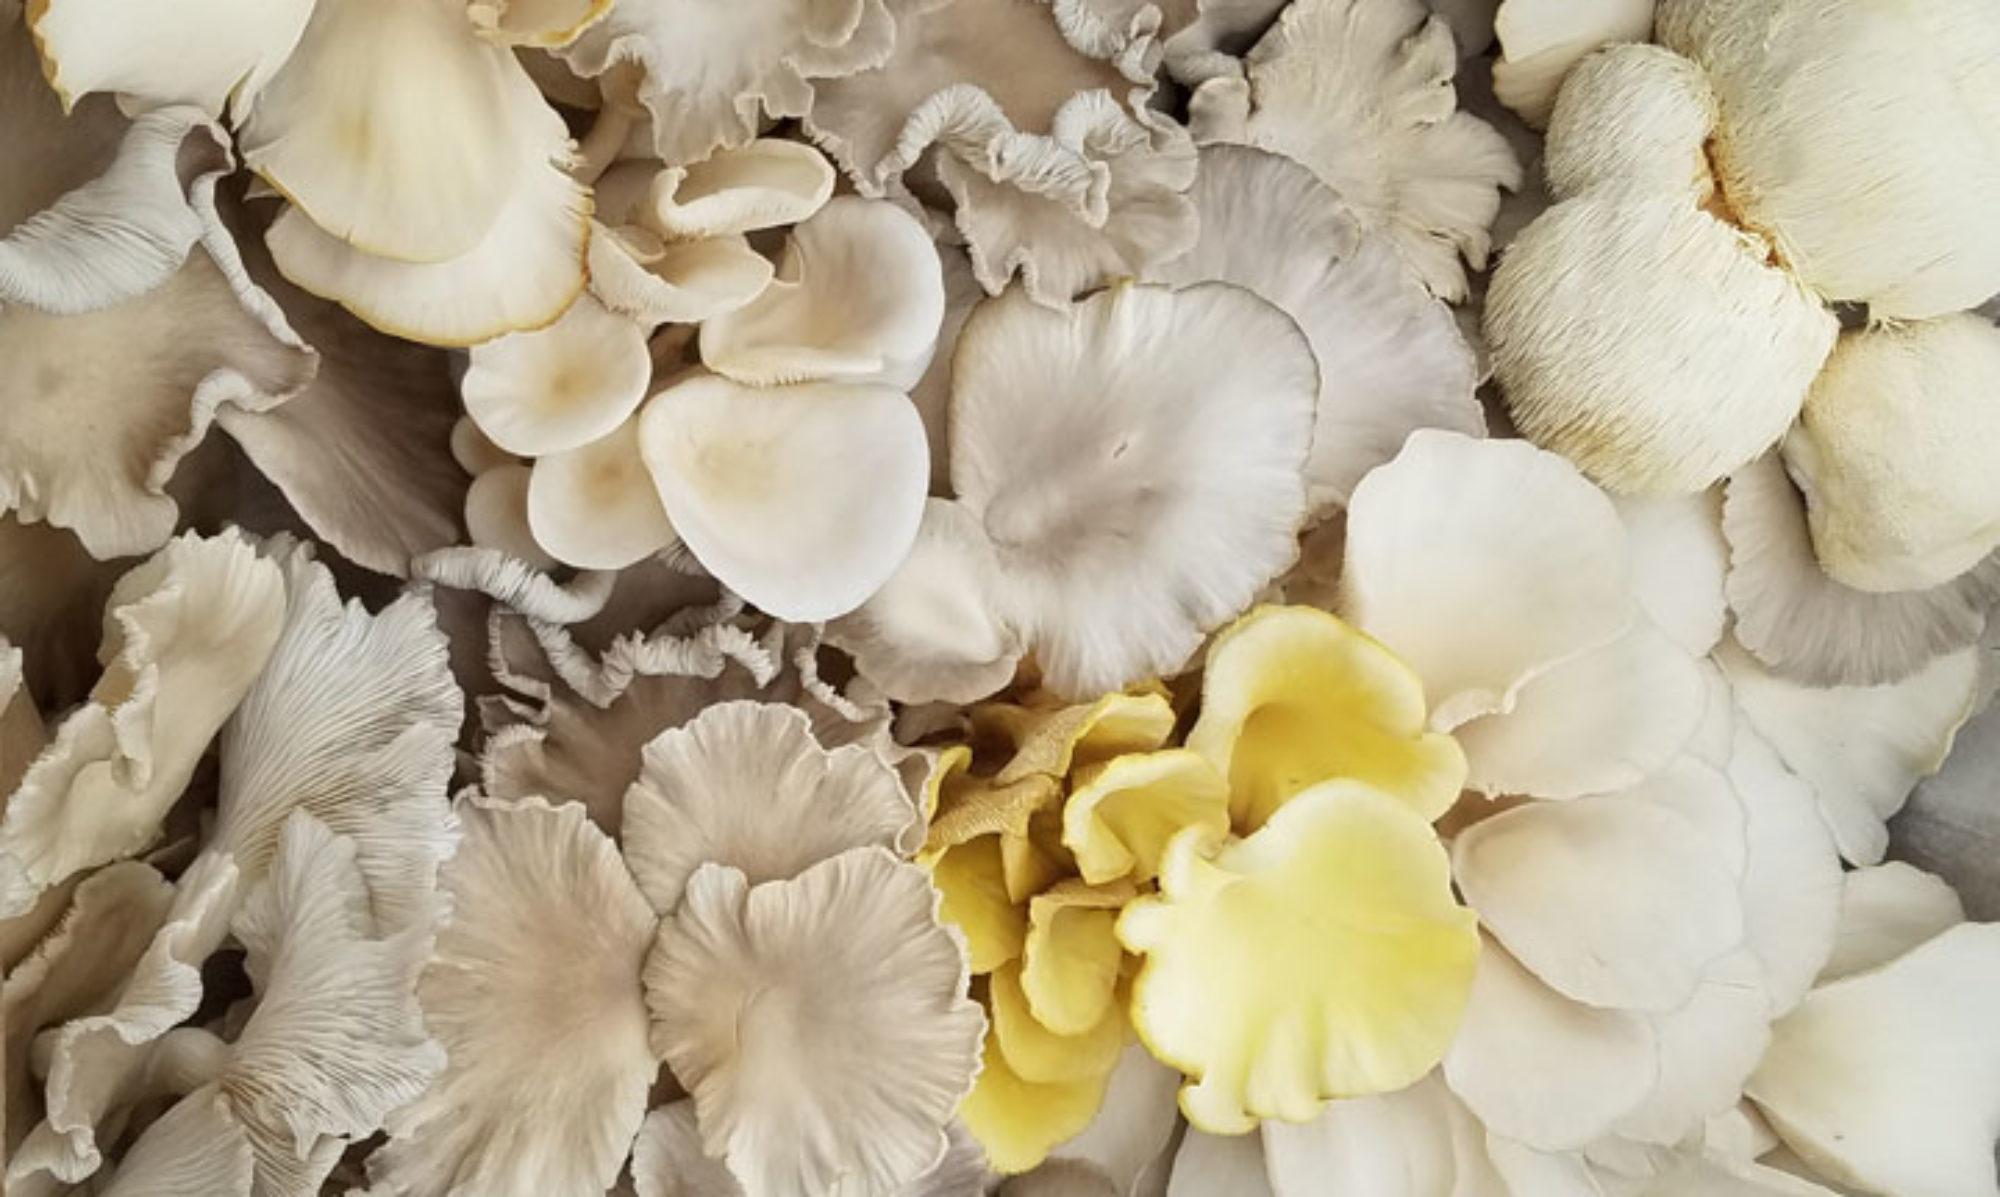 Gnome Grown Mushrooms